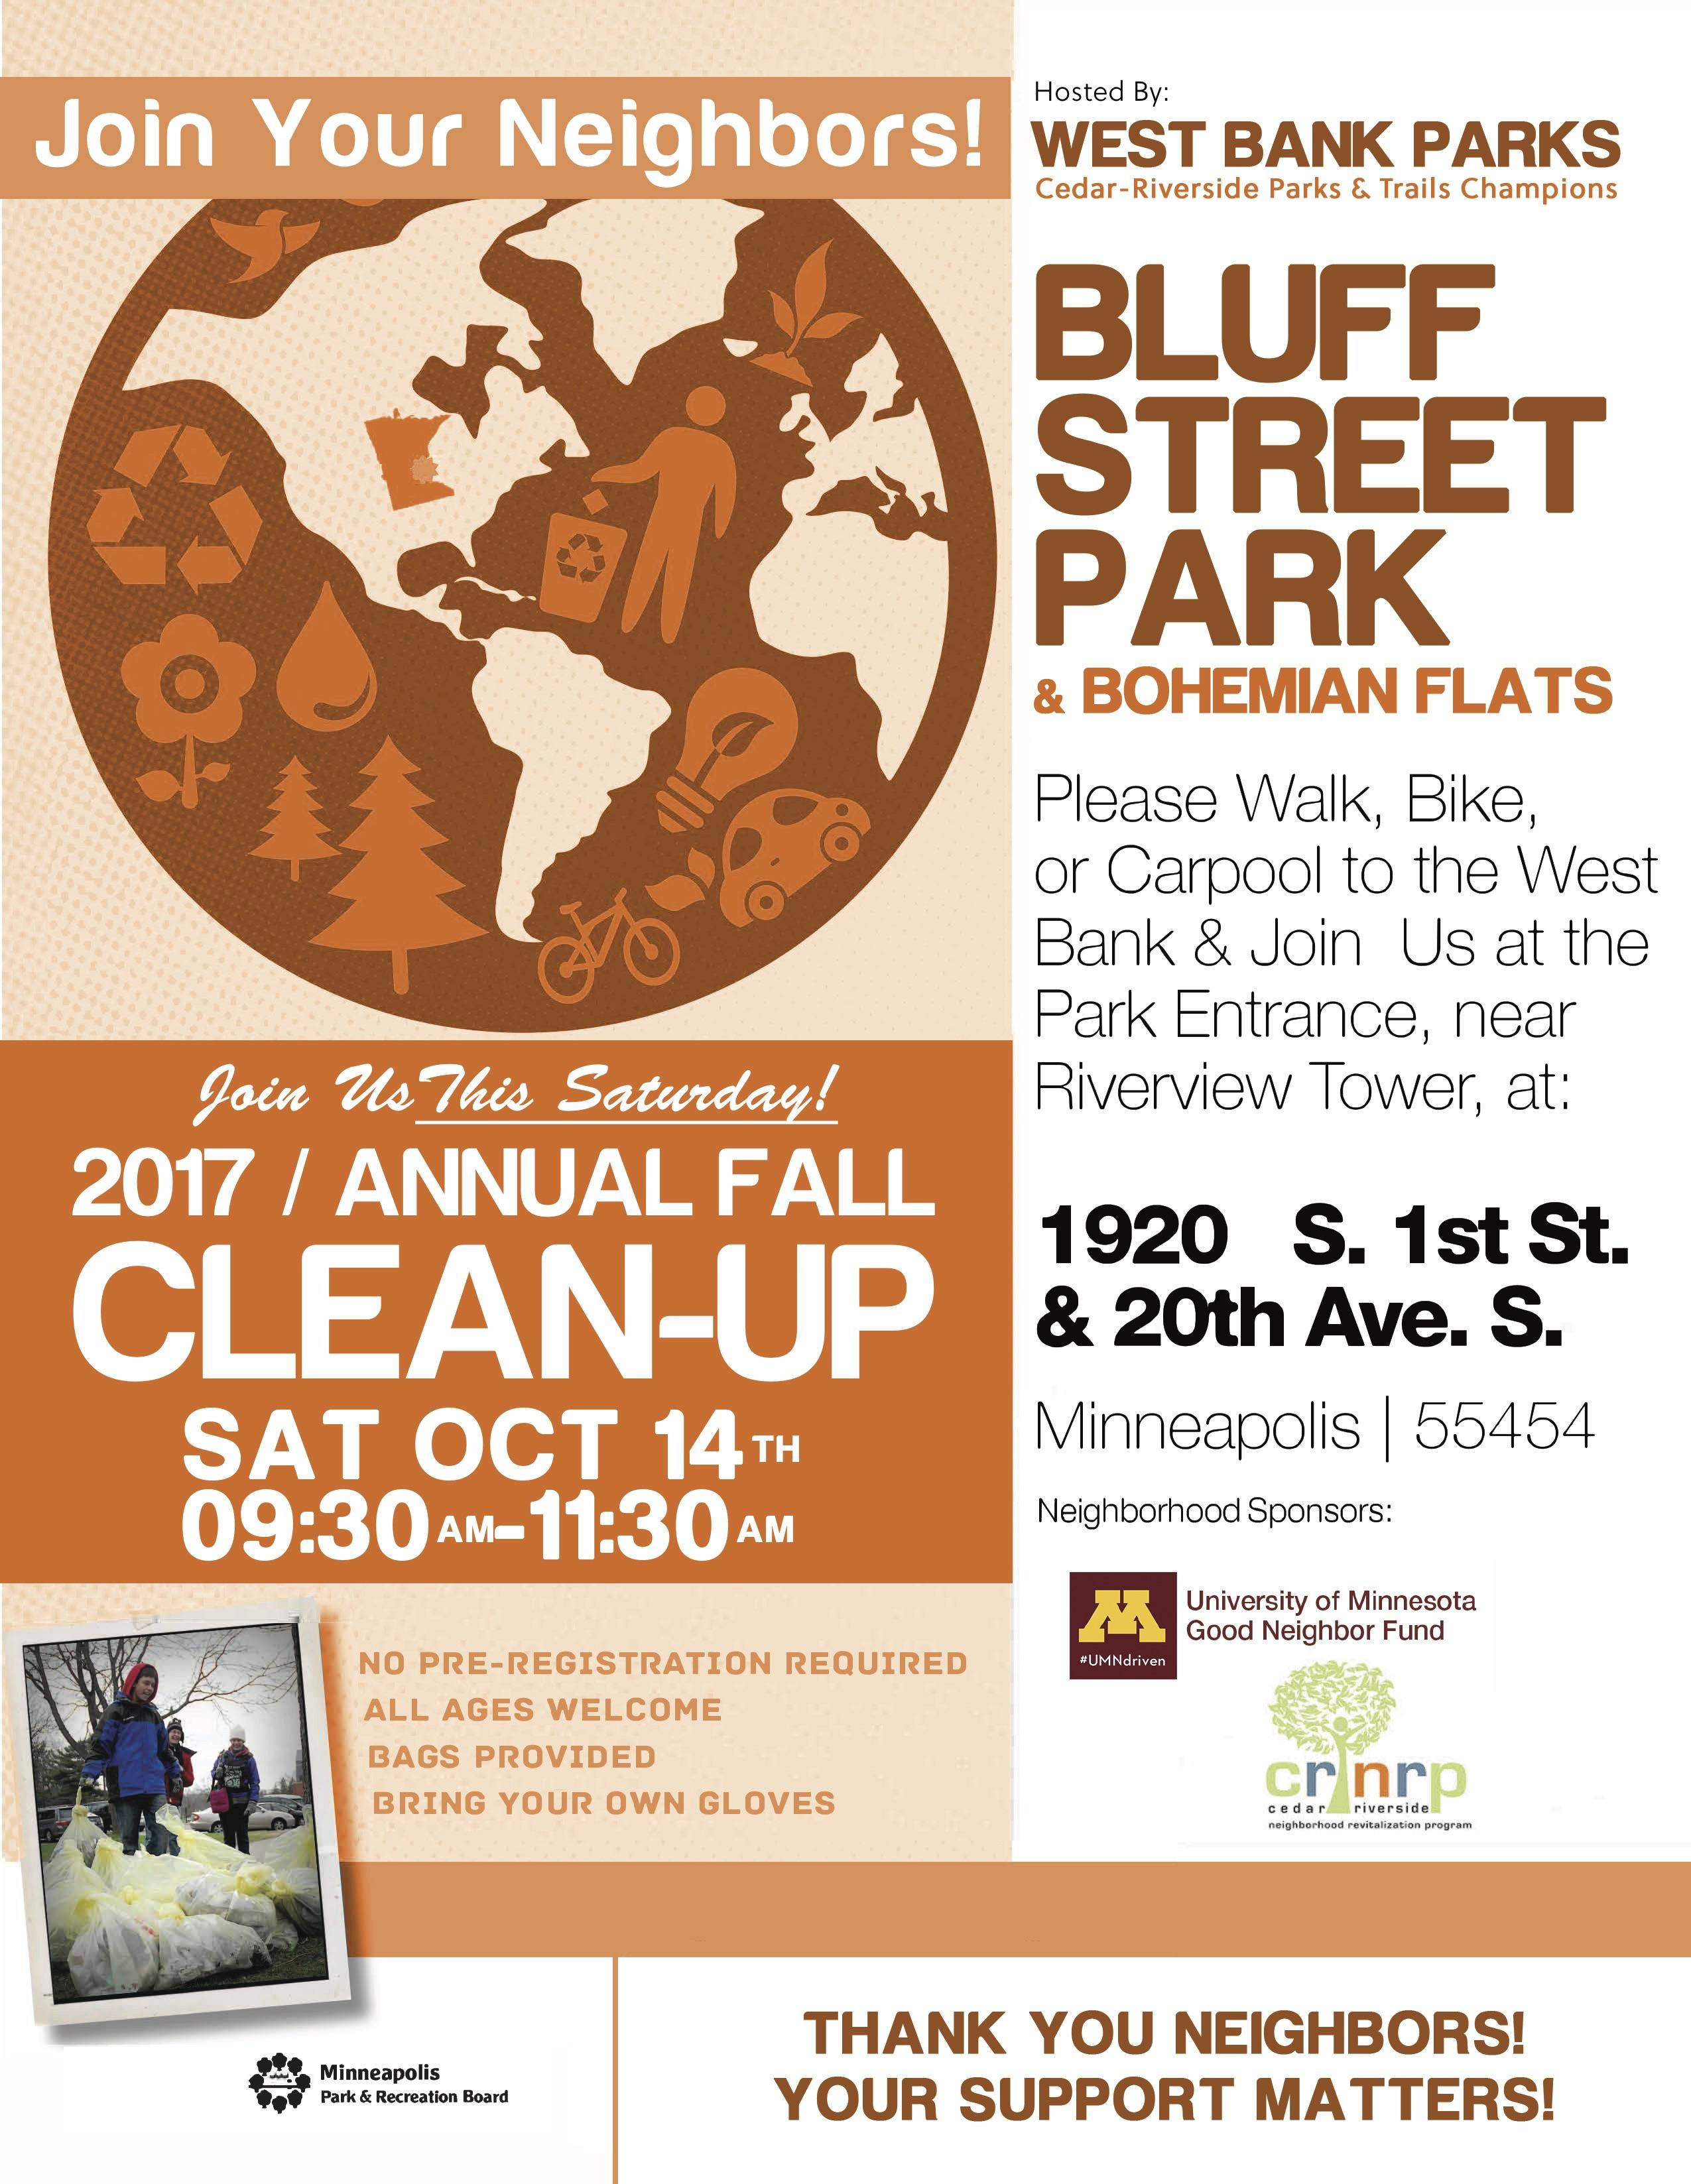 2017-West_Bank_Parks_Fall_Cleanup_-_Bluff_Street_Park___Bohemian_Flats.jpg